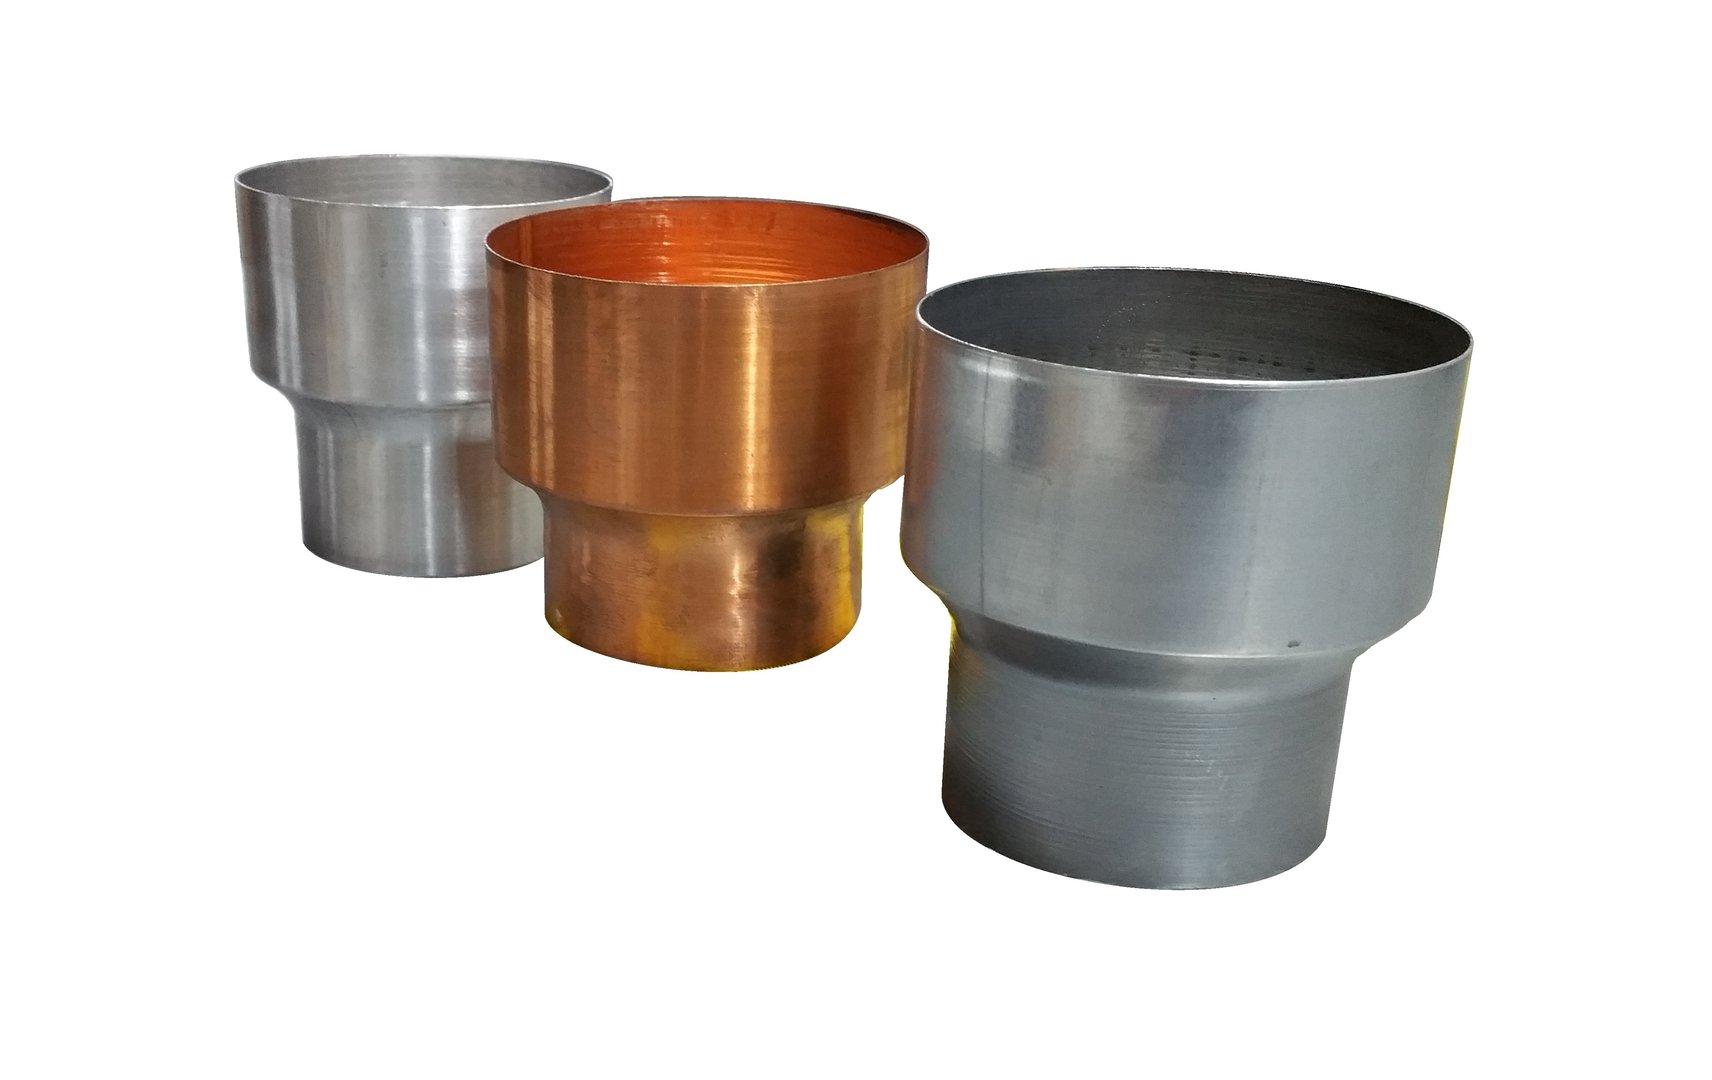 Reduzierstück Fallrohrreduzierung nach DIN EN 612 Metall in Form